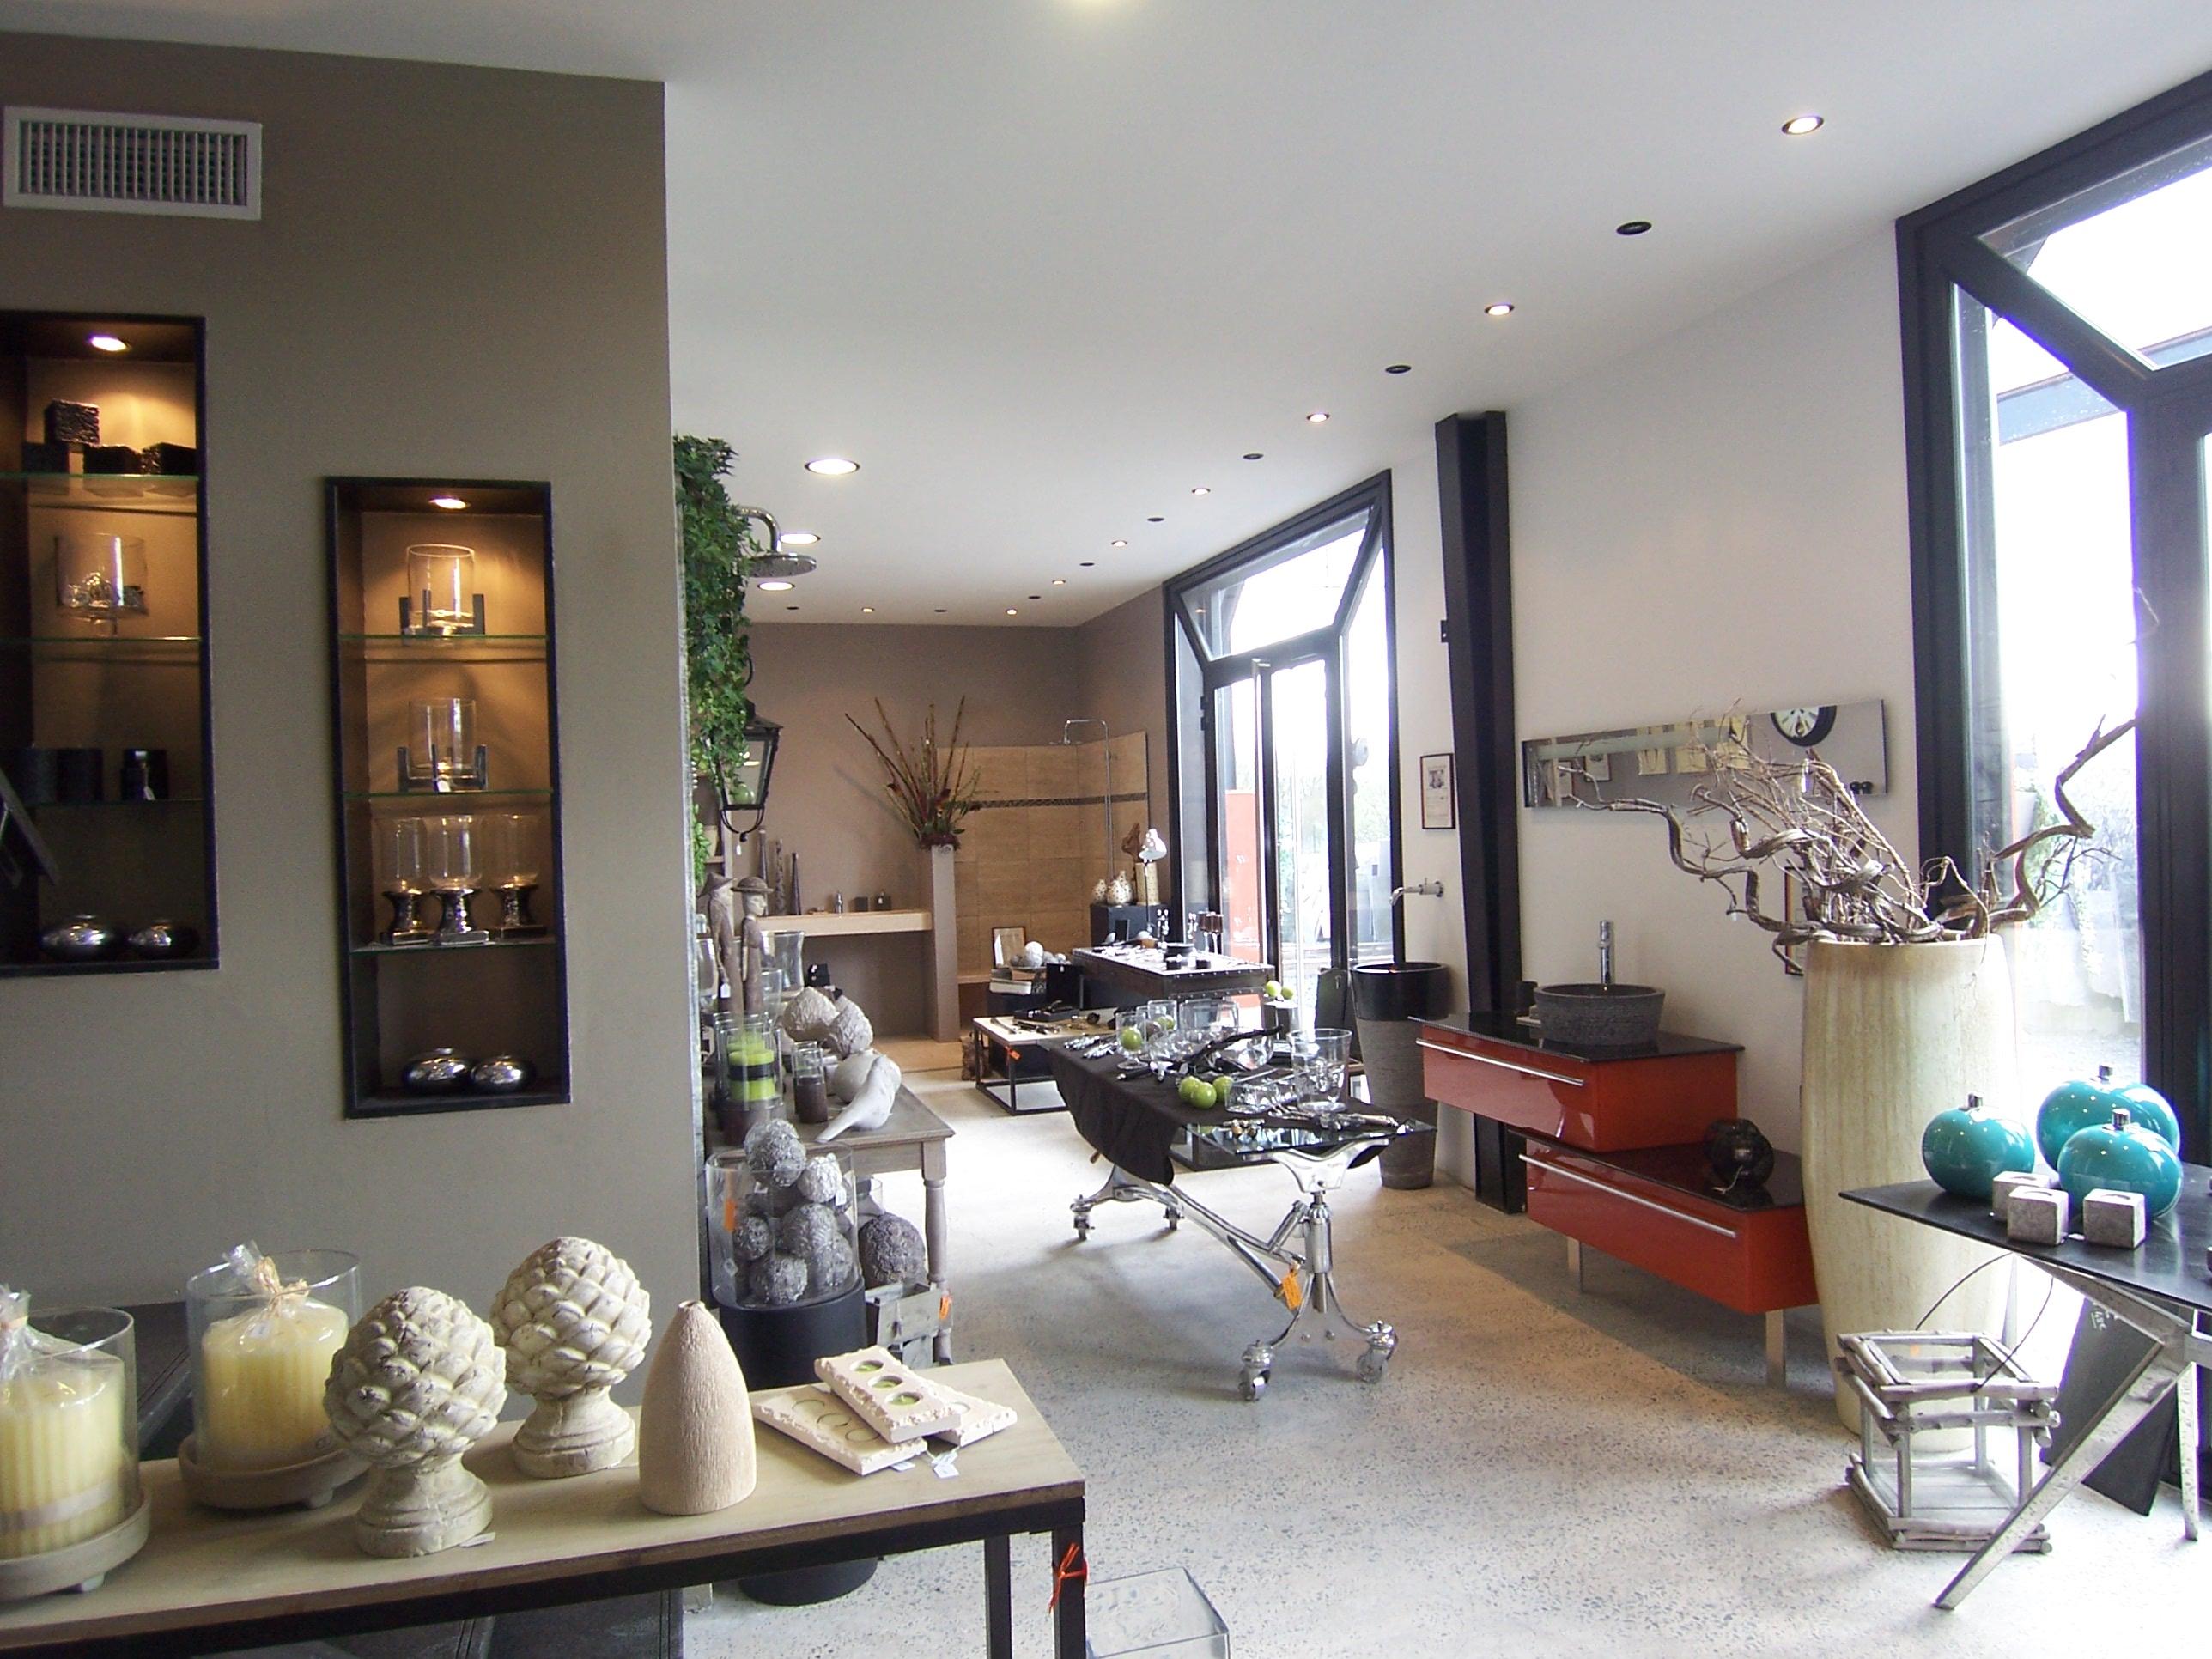 boutique decoration interieur design en image. Black Bedroom Furniture Sets. Home Design Ideas